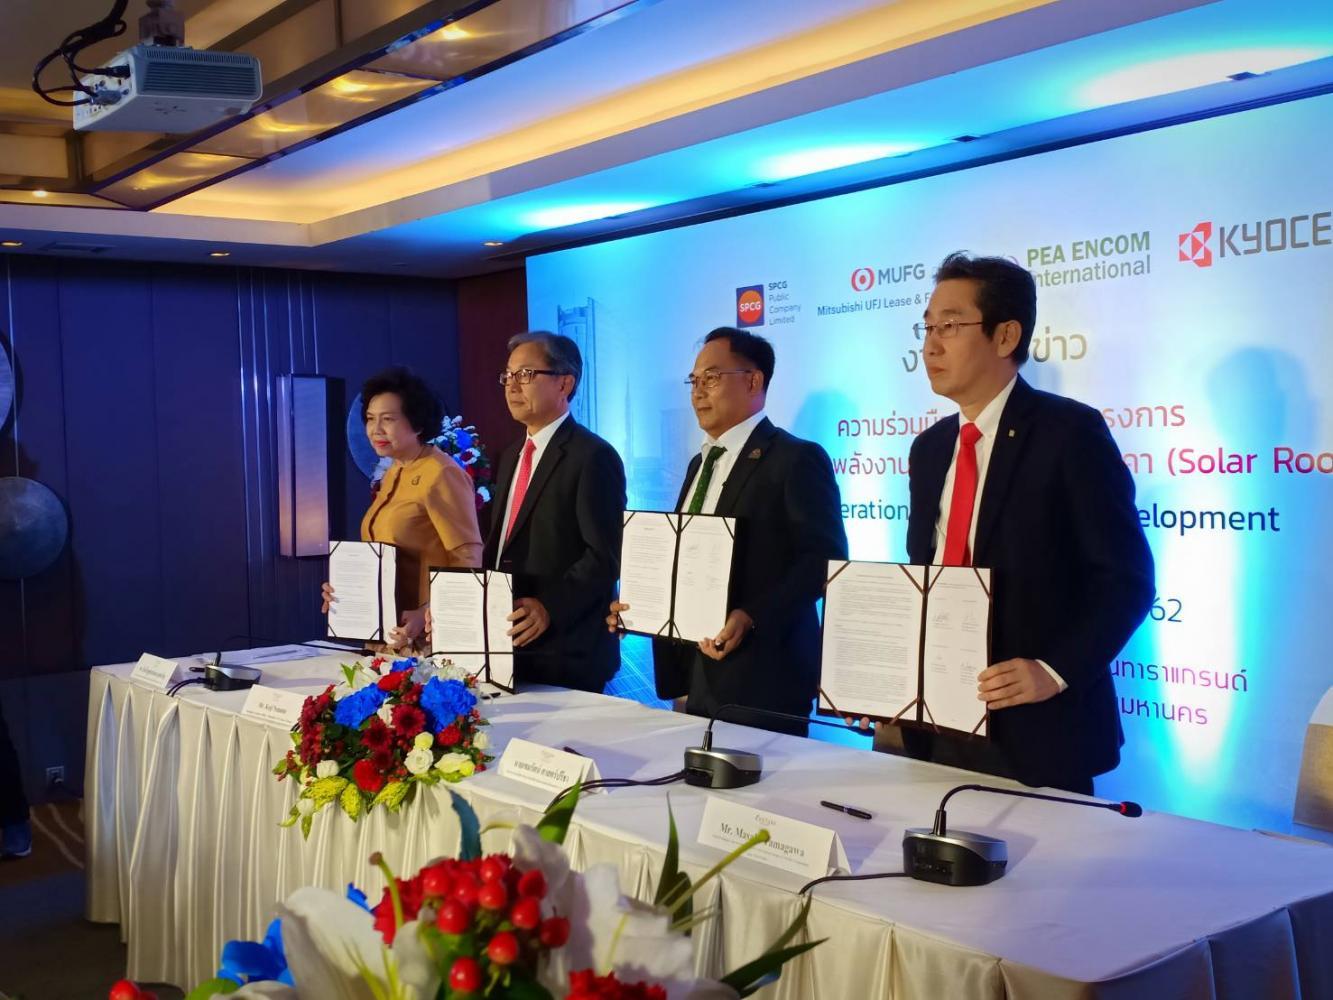 From leftMrs Wandee, Mr Nemoto, Khemmarat Sartpreecha, acting managing director of PEA Encom, and Mr Tamagawa display the joint venture.